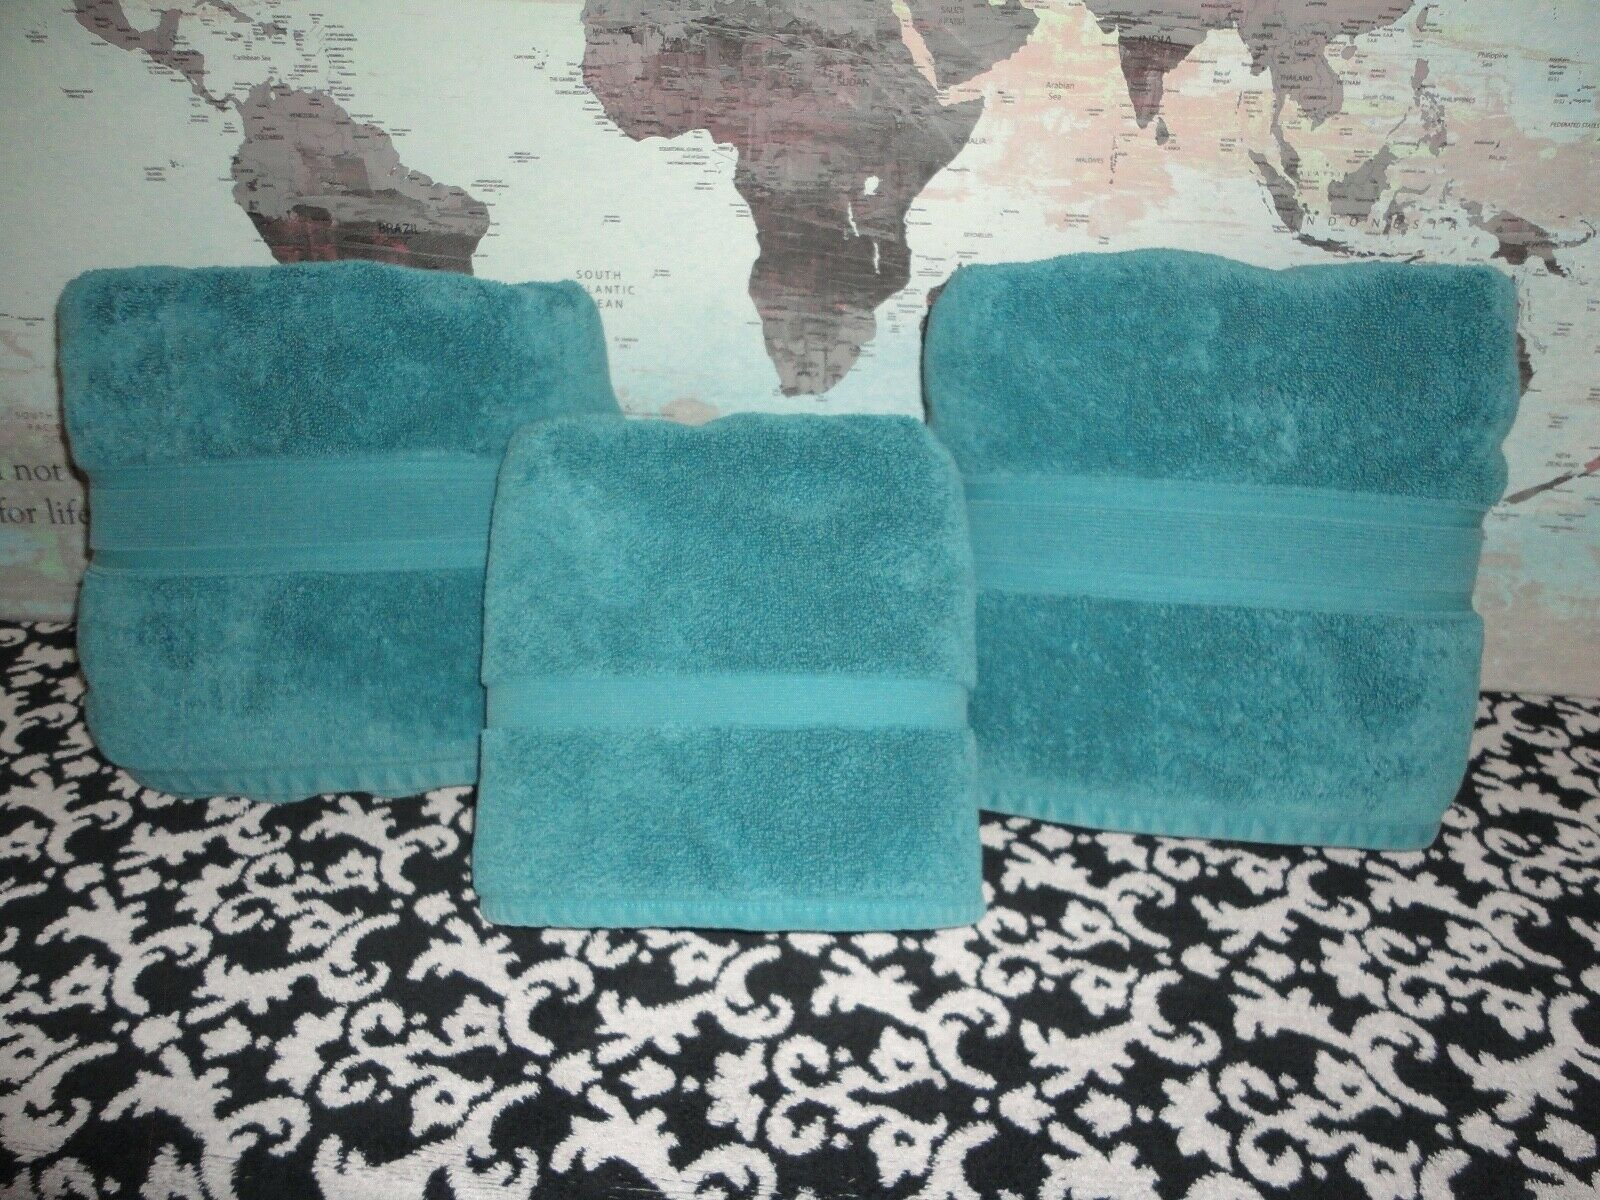 WAMSUTTA ICON DARK TEAL (3PC) THICK BATH & STEP MAT TOWEL SET